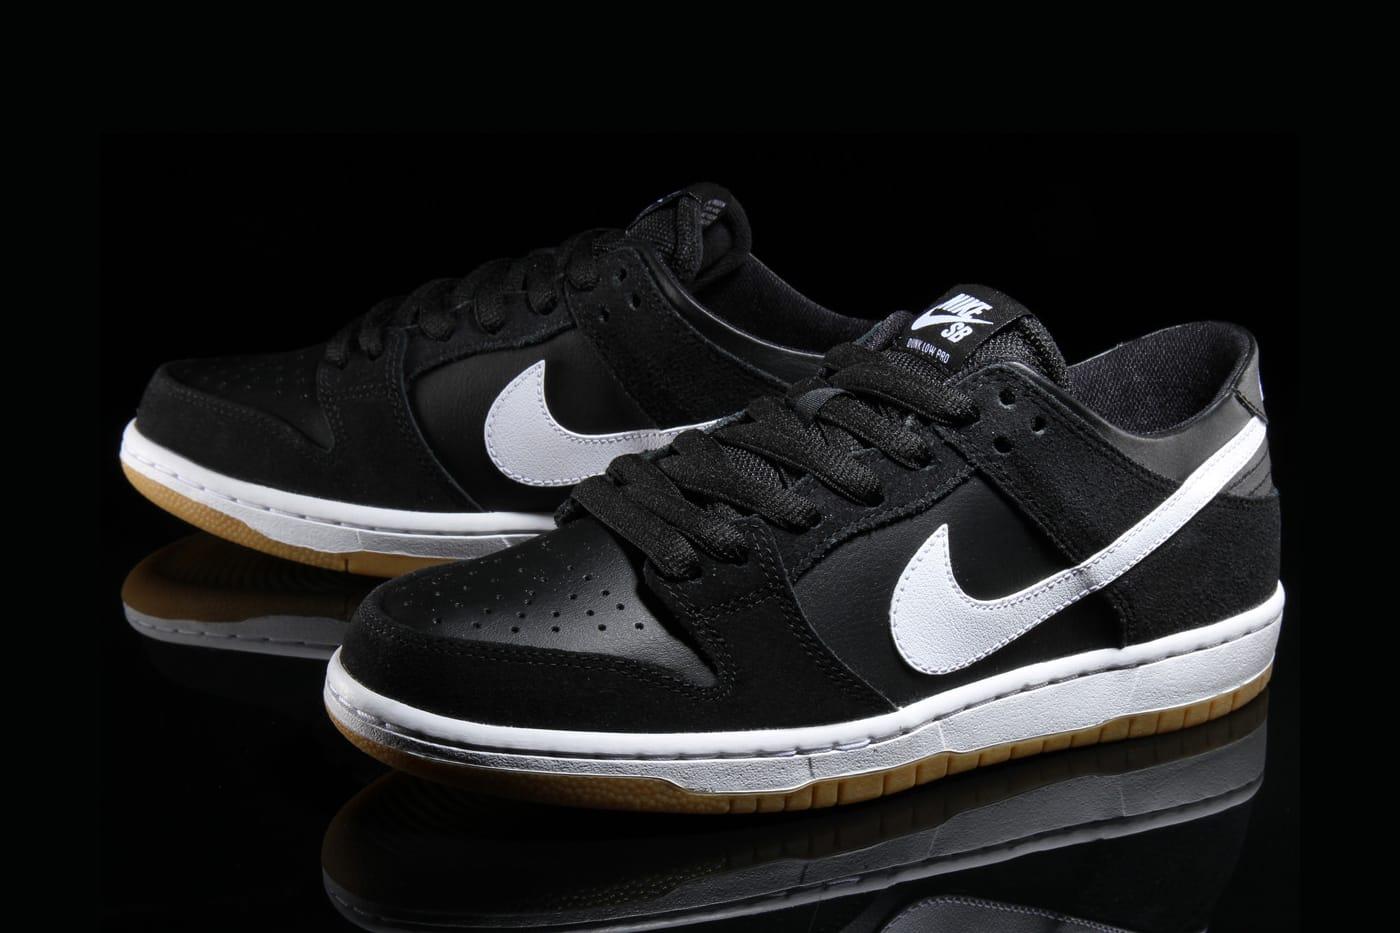 Nike SB Dunk Low Pro in Classic Black